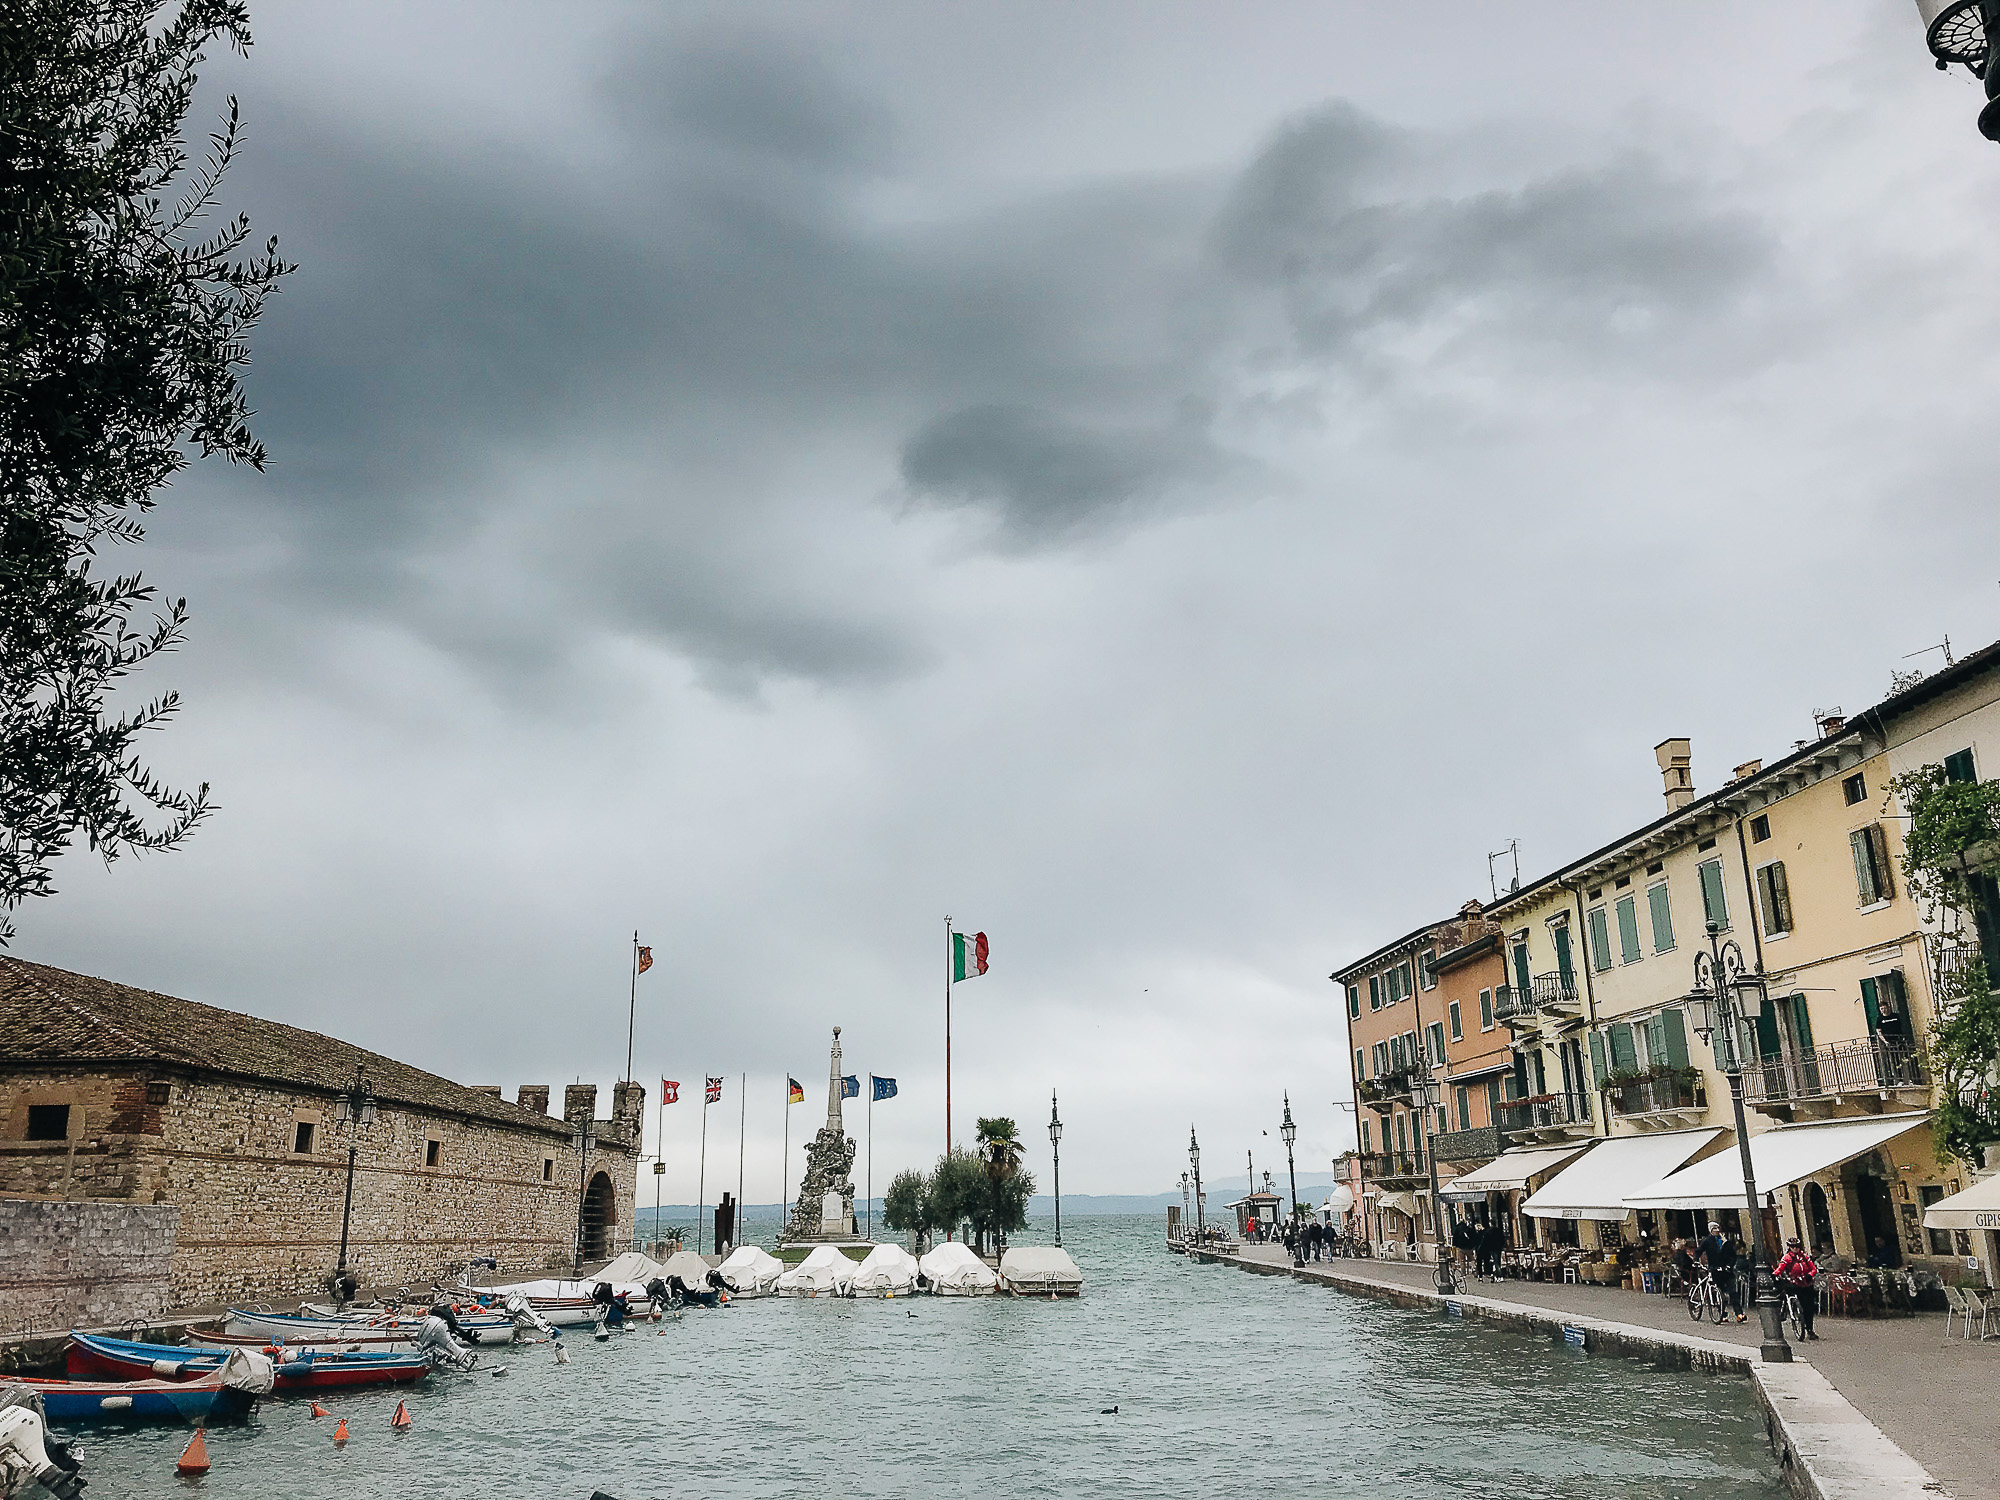 OurBeautifulAdventure-LakeGarda-Italy-Blog-6425.jpg